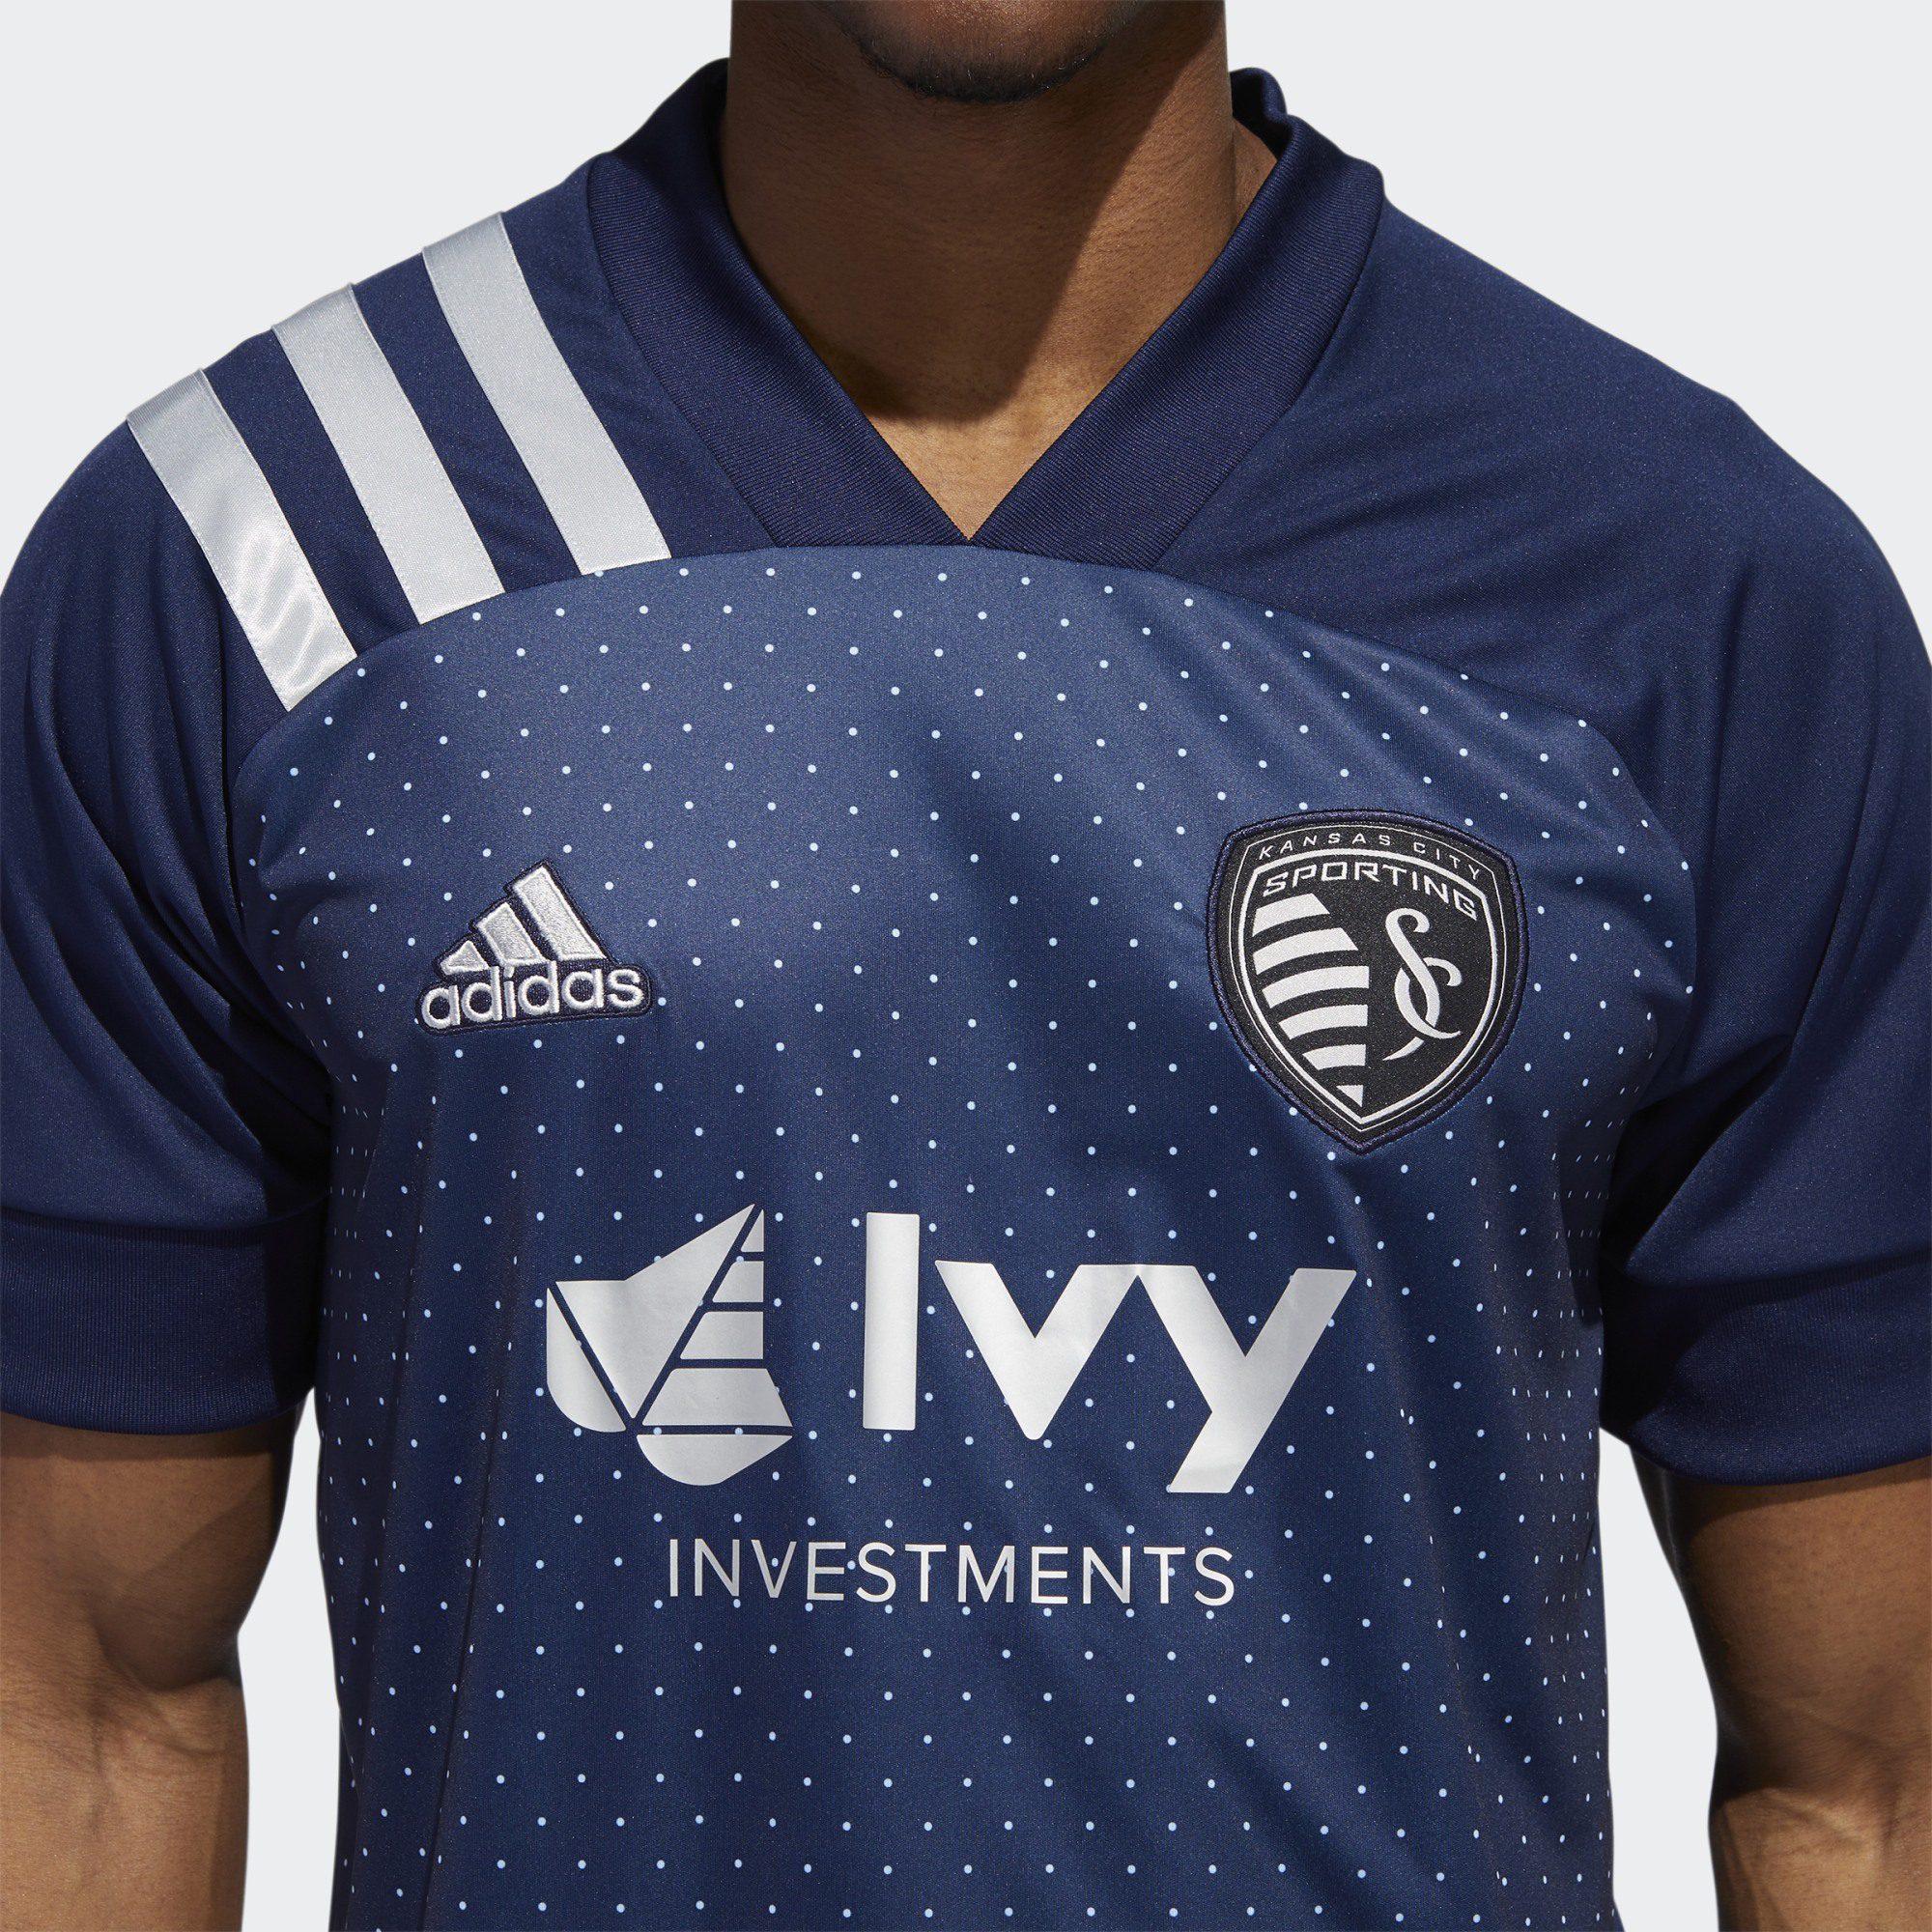 Sporting Kansas City 2020-21 Adidas Away Kit | 20/21 Kits ...